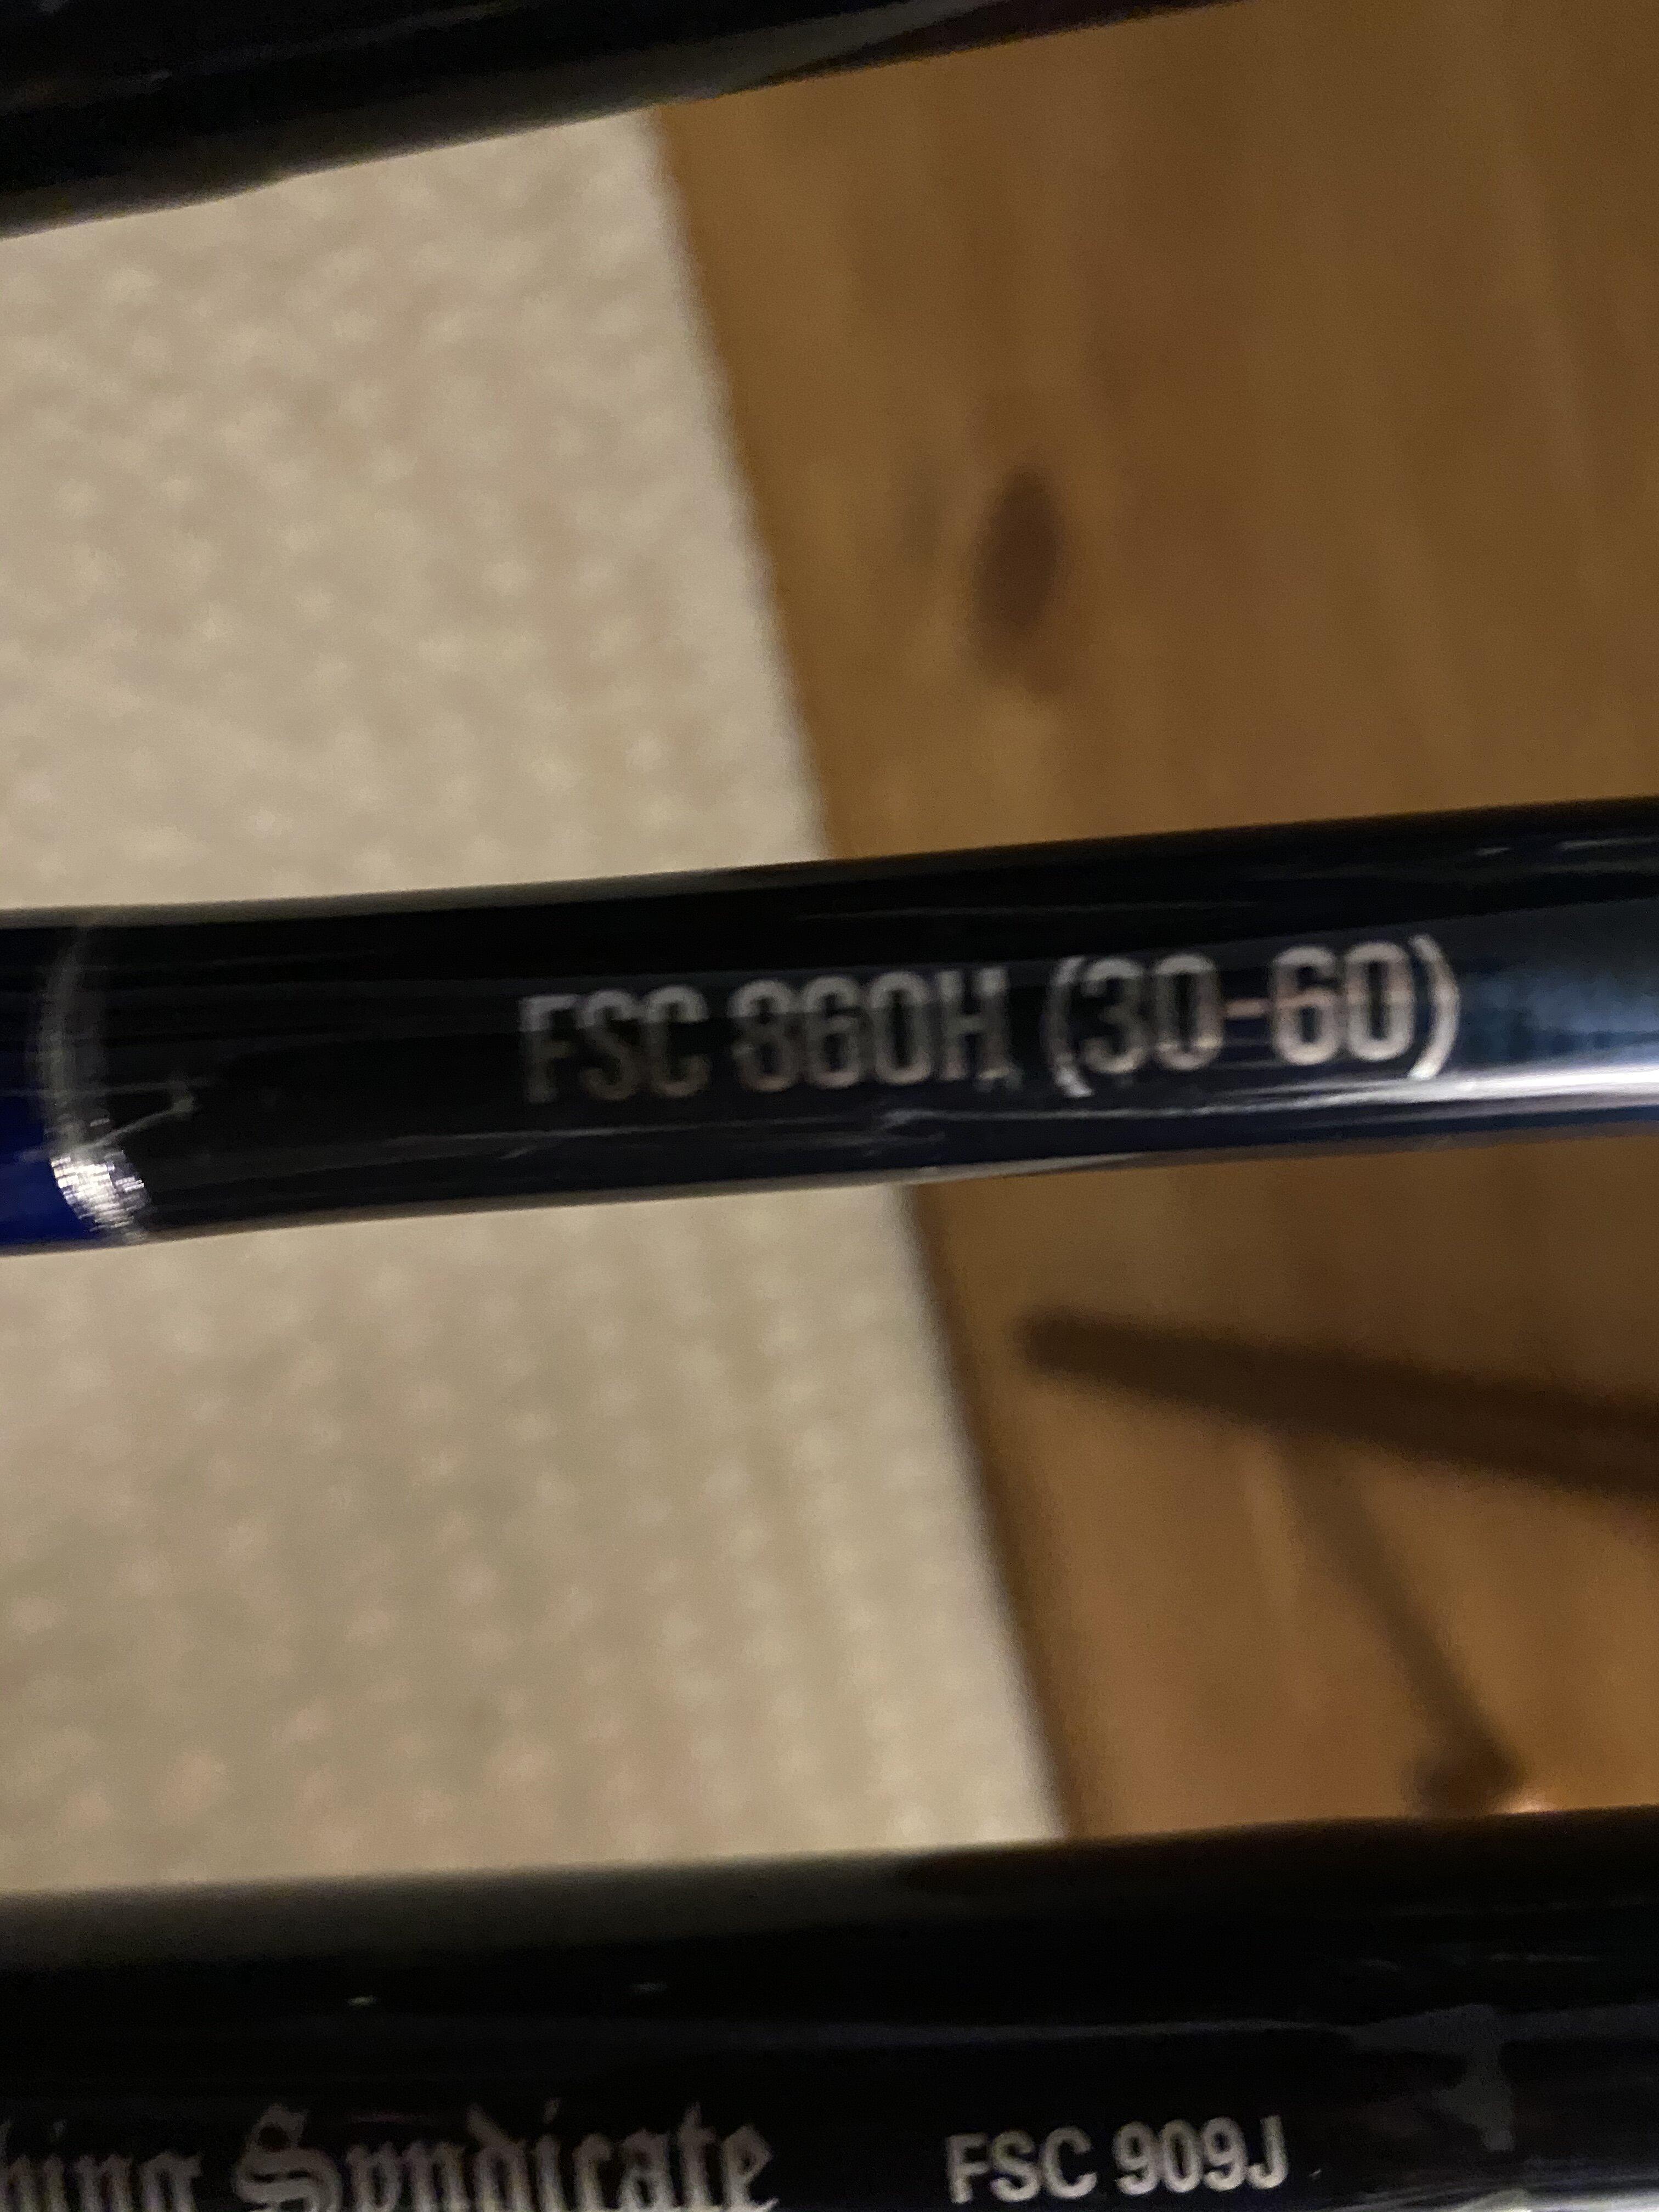 E78CD7A3-272B-4E18-990C-A97F9083A747.jpeg